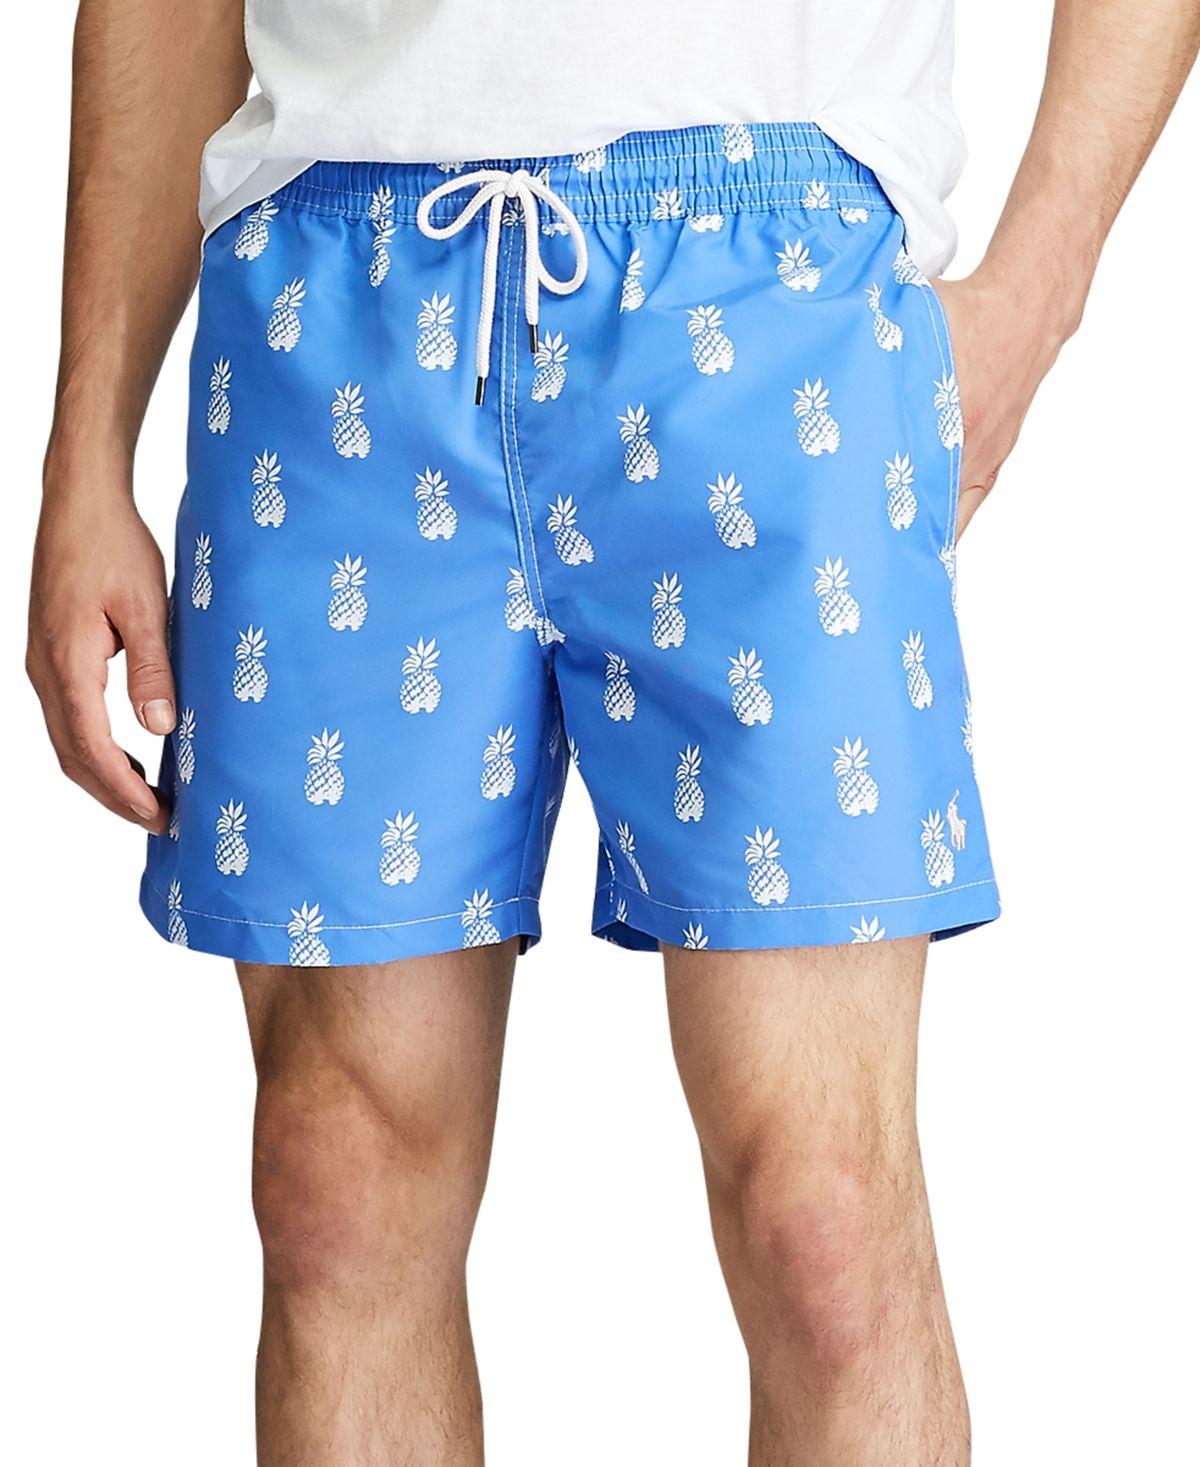 Polo Ralph Lauren Men S 5 5 Inch Traveler Swim Trunks Bathsheba Pineapples Polo Ralph Lauren Polo Ralph Lauren Mens Ralph Lauren Men